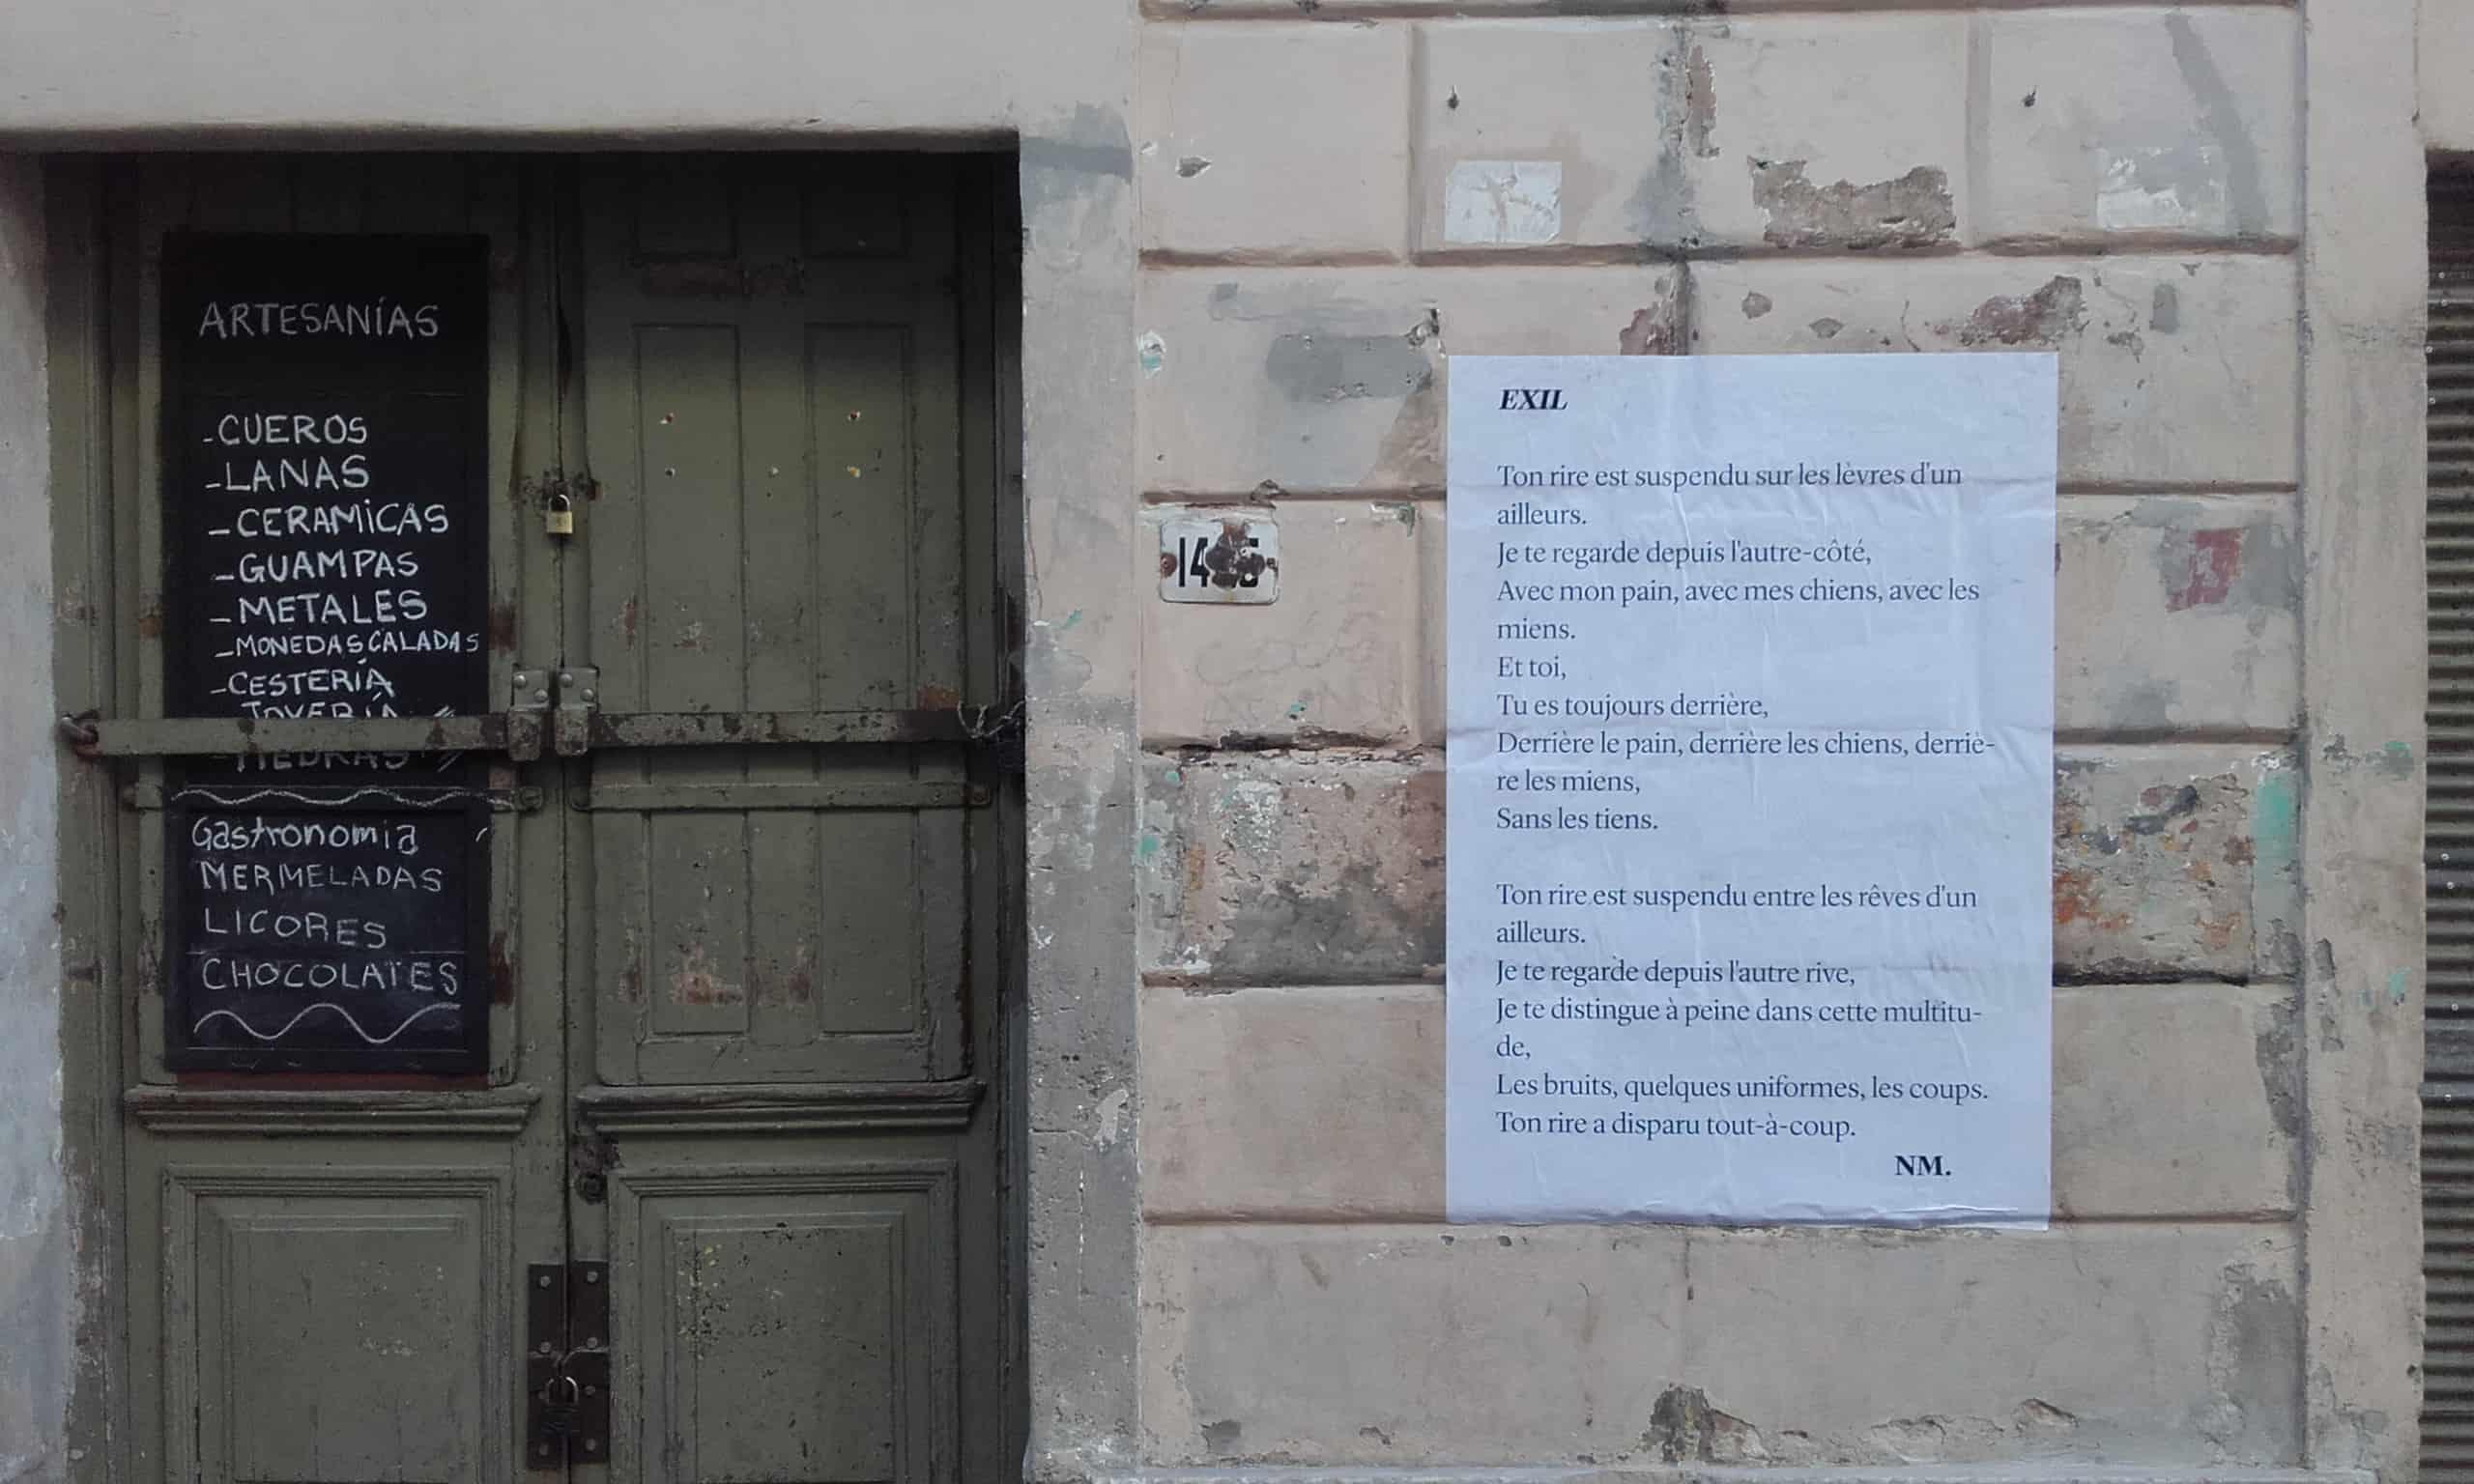 exil, poème de rue, montevideo, uruguay, nathalie man, poésie, fiu